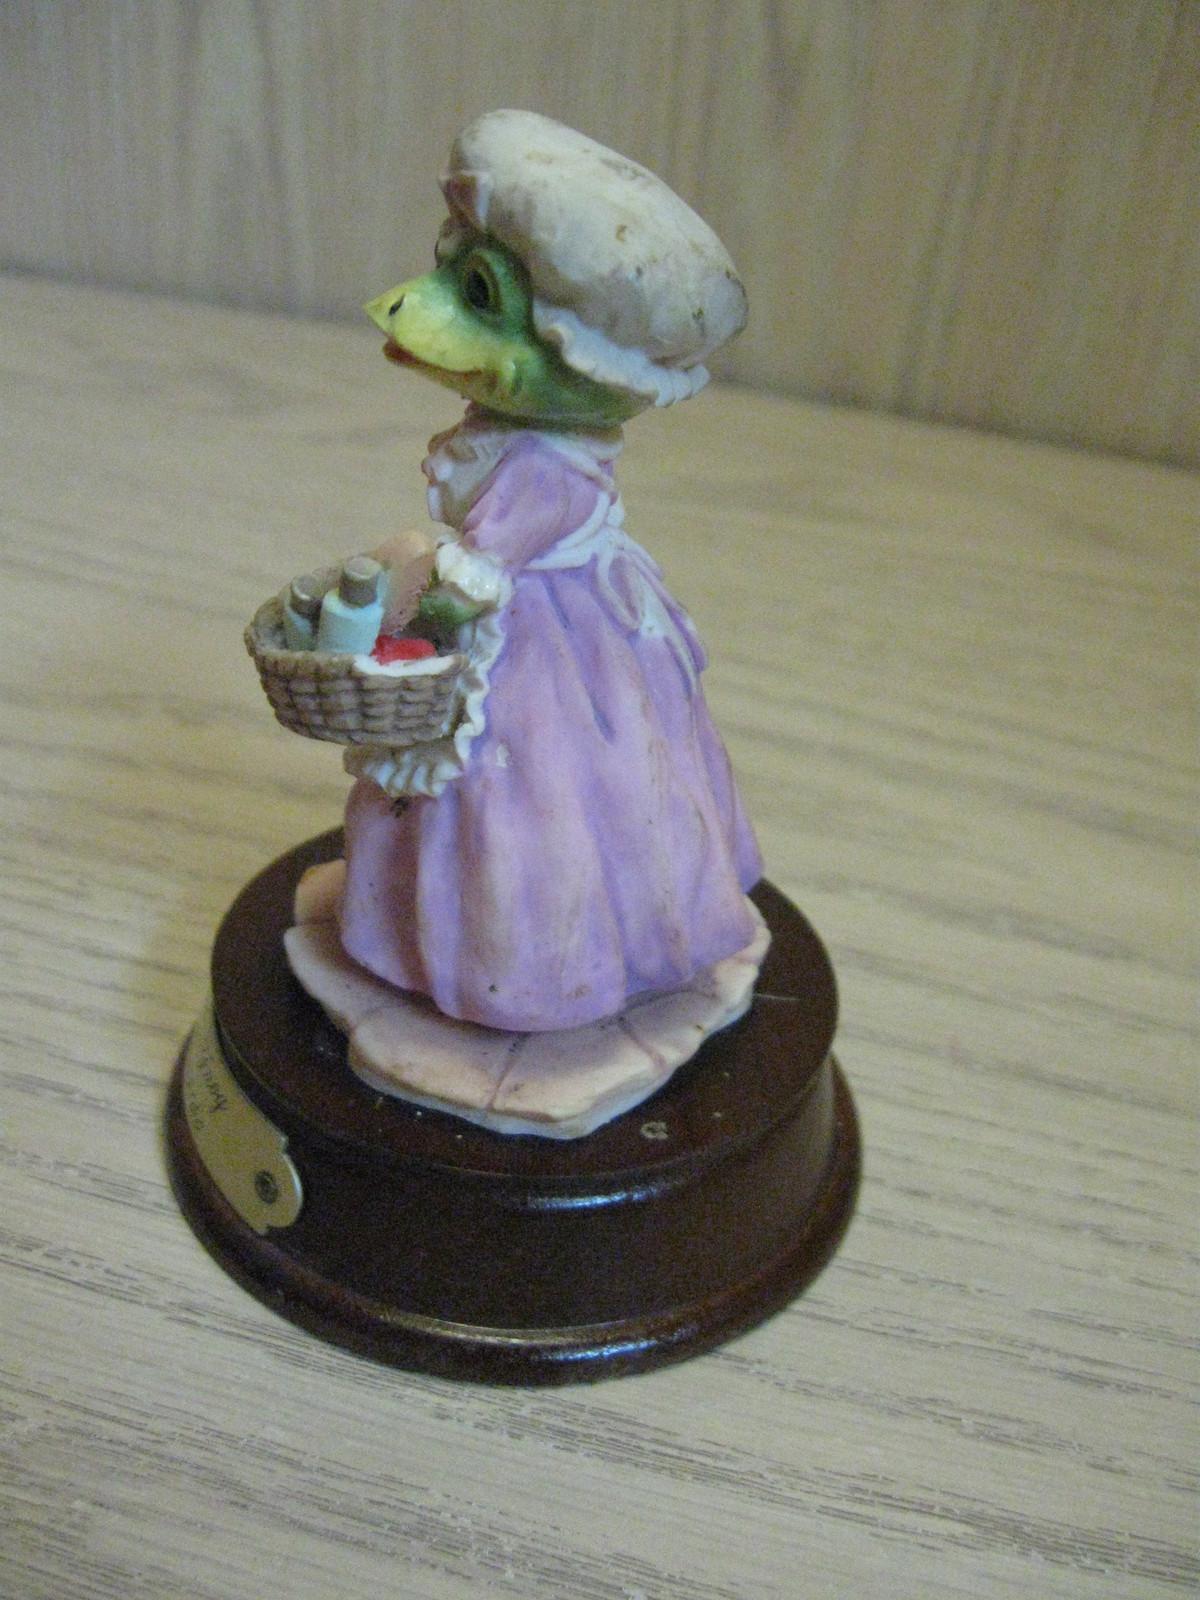 Figurine Felicity Frog Leonardo Little Nook Village LN-26  1989 image 2